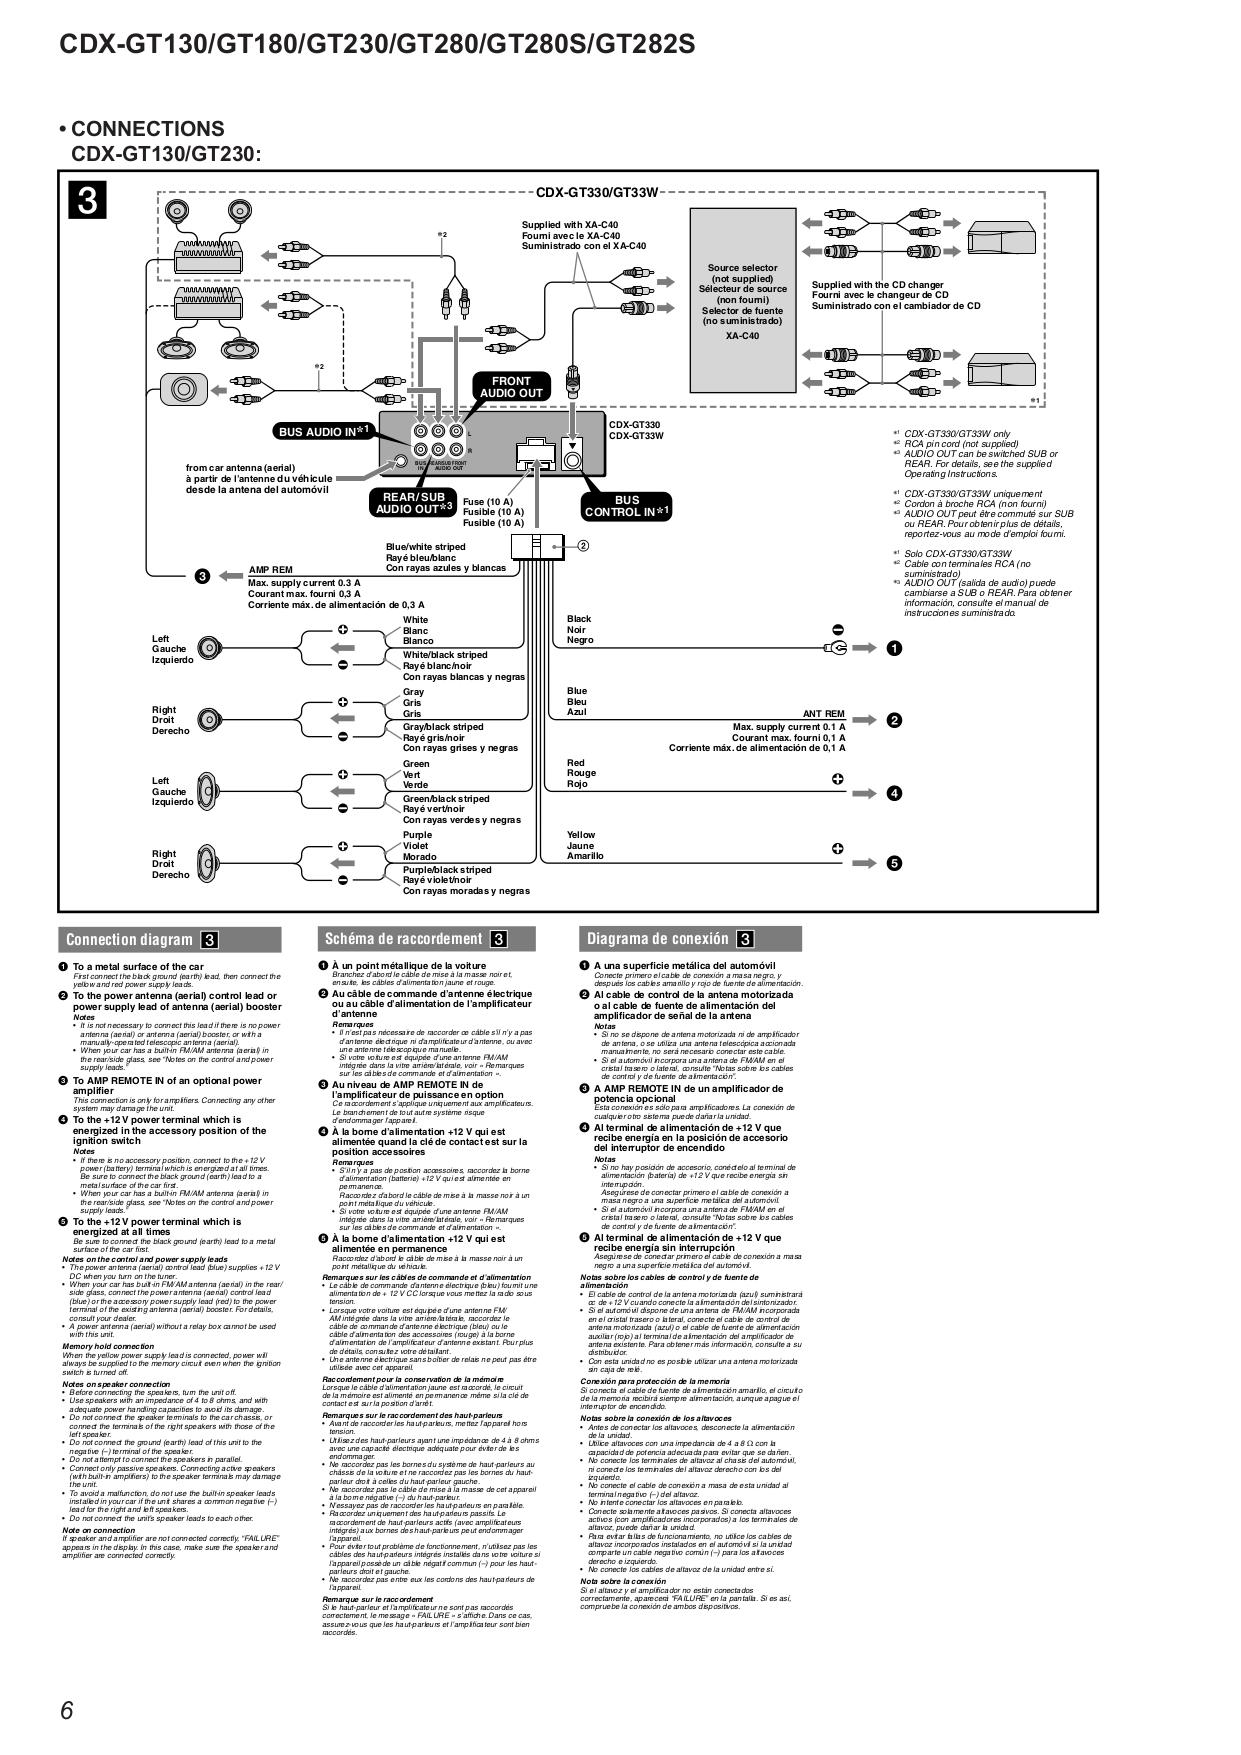 sony xplod cdx gt330 wiring diagram wiring diagram manual for sony car receiver xplod cdx gt330 on wiring diagram